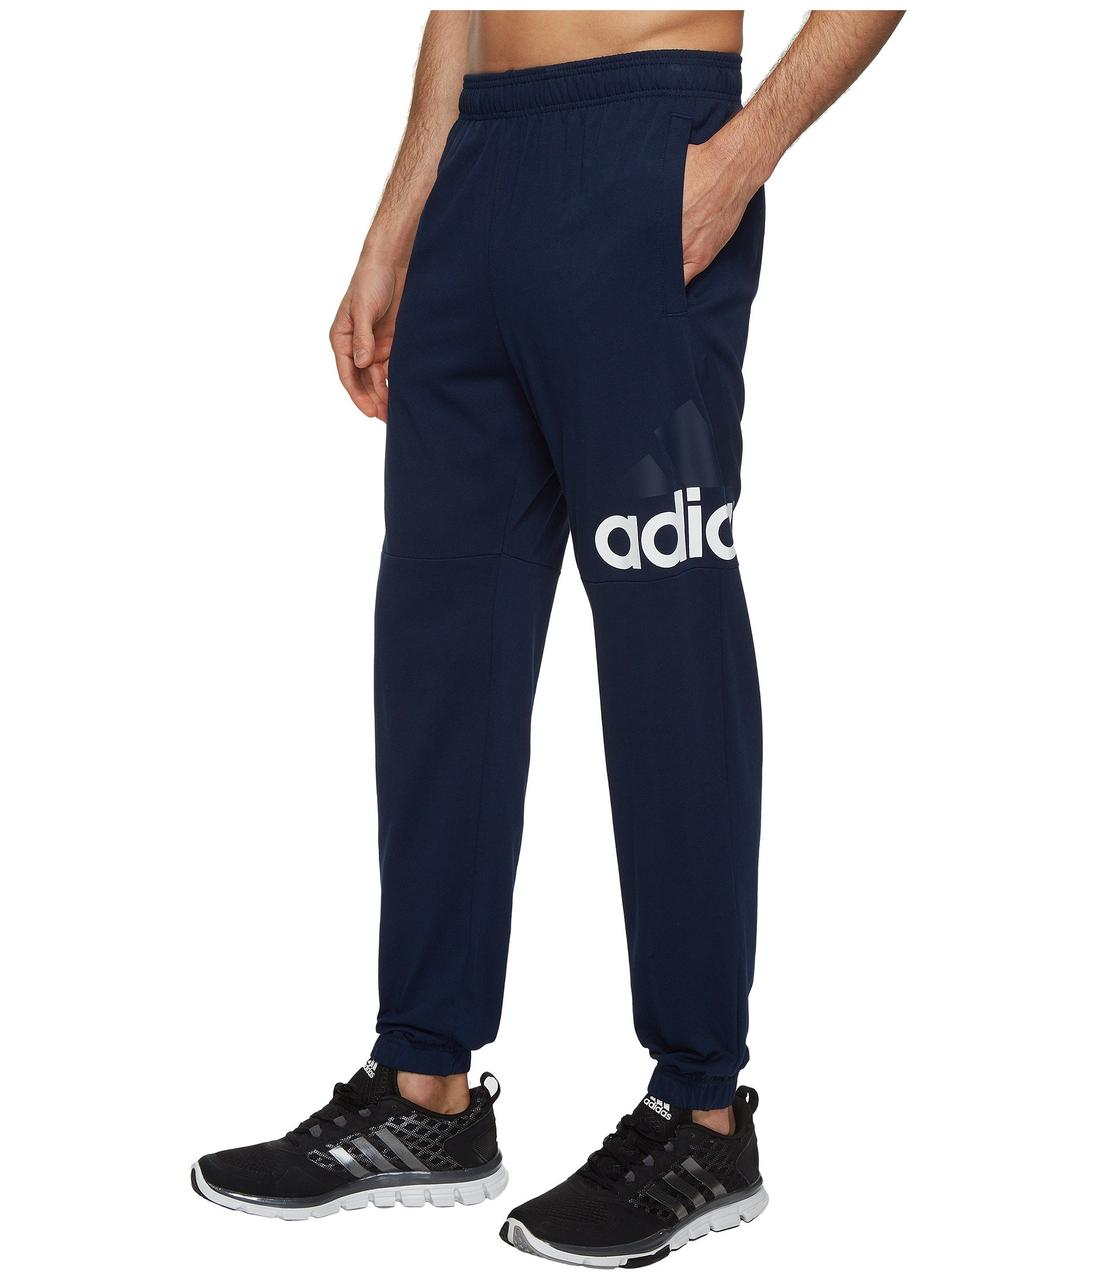 1025d8b0 Штаны Adidas Essentials Track SJ Logo Pants Navy - Оригинал — в ...